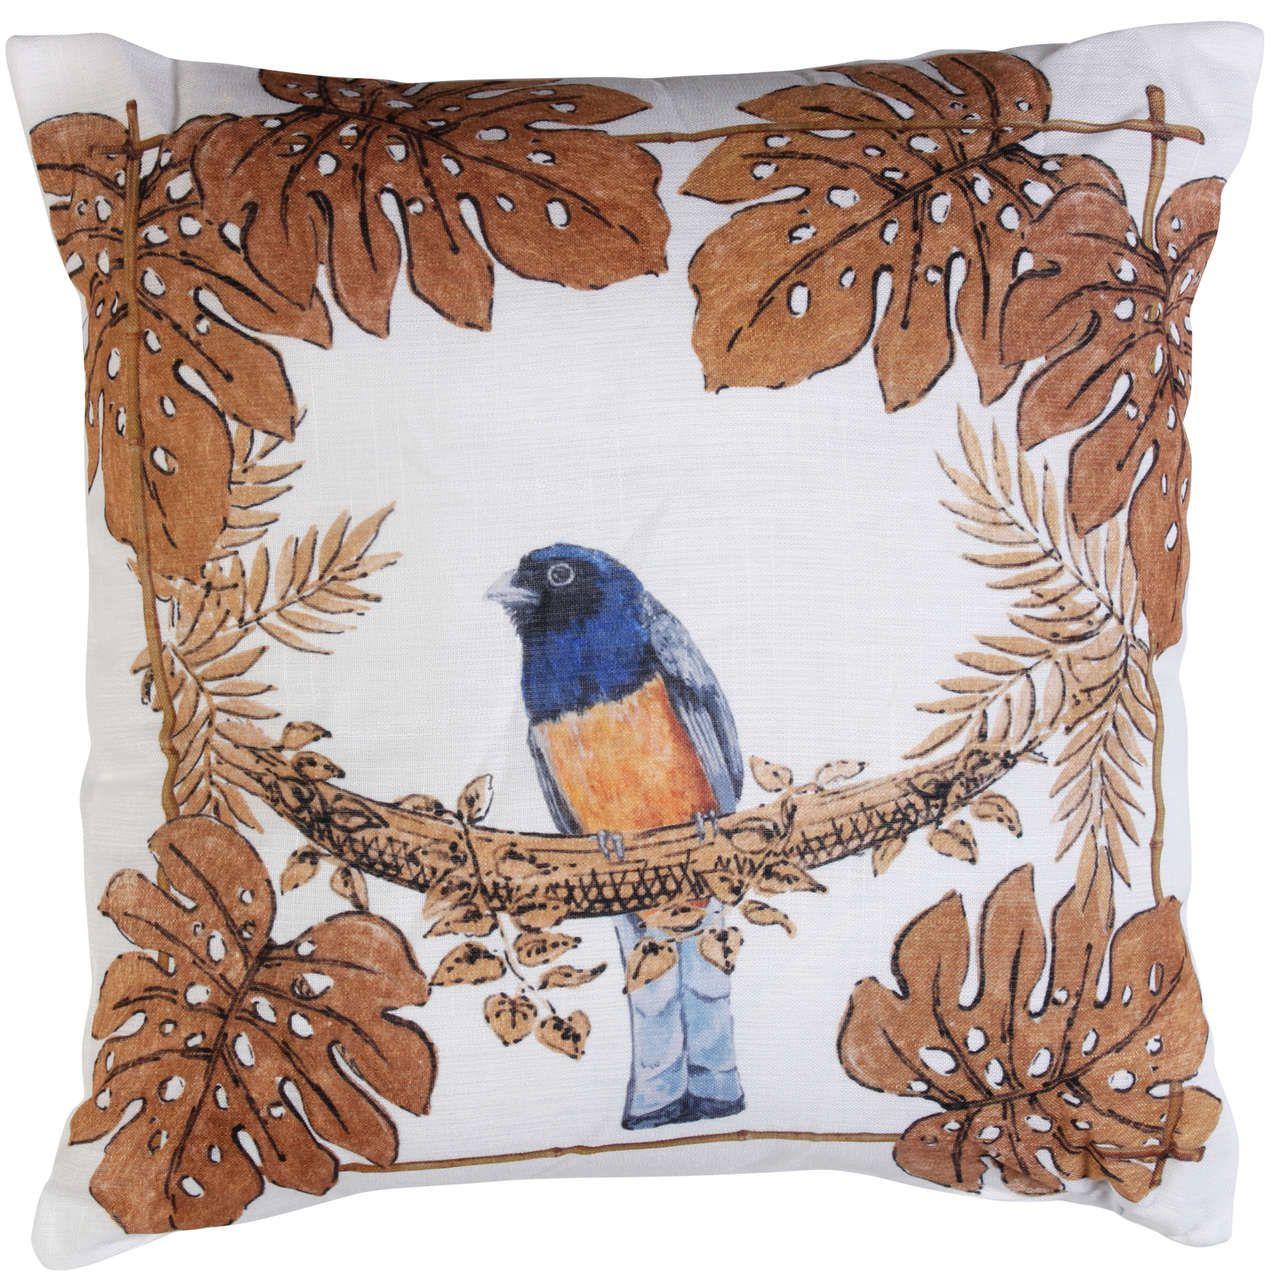 Almofada Golden Forest Pássaro Azul Cód.: 3561 - MB